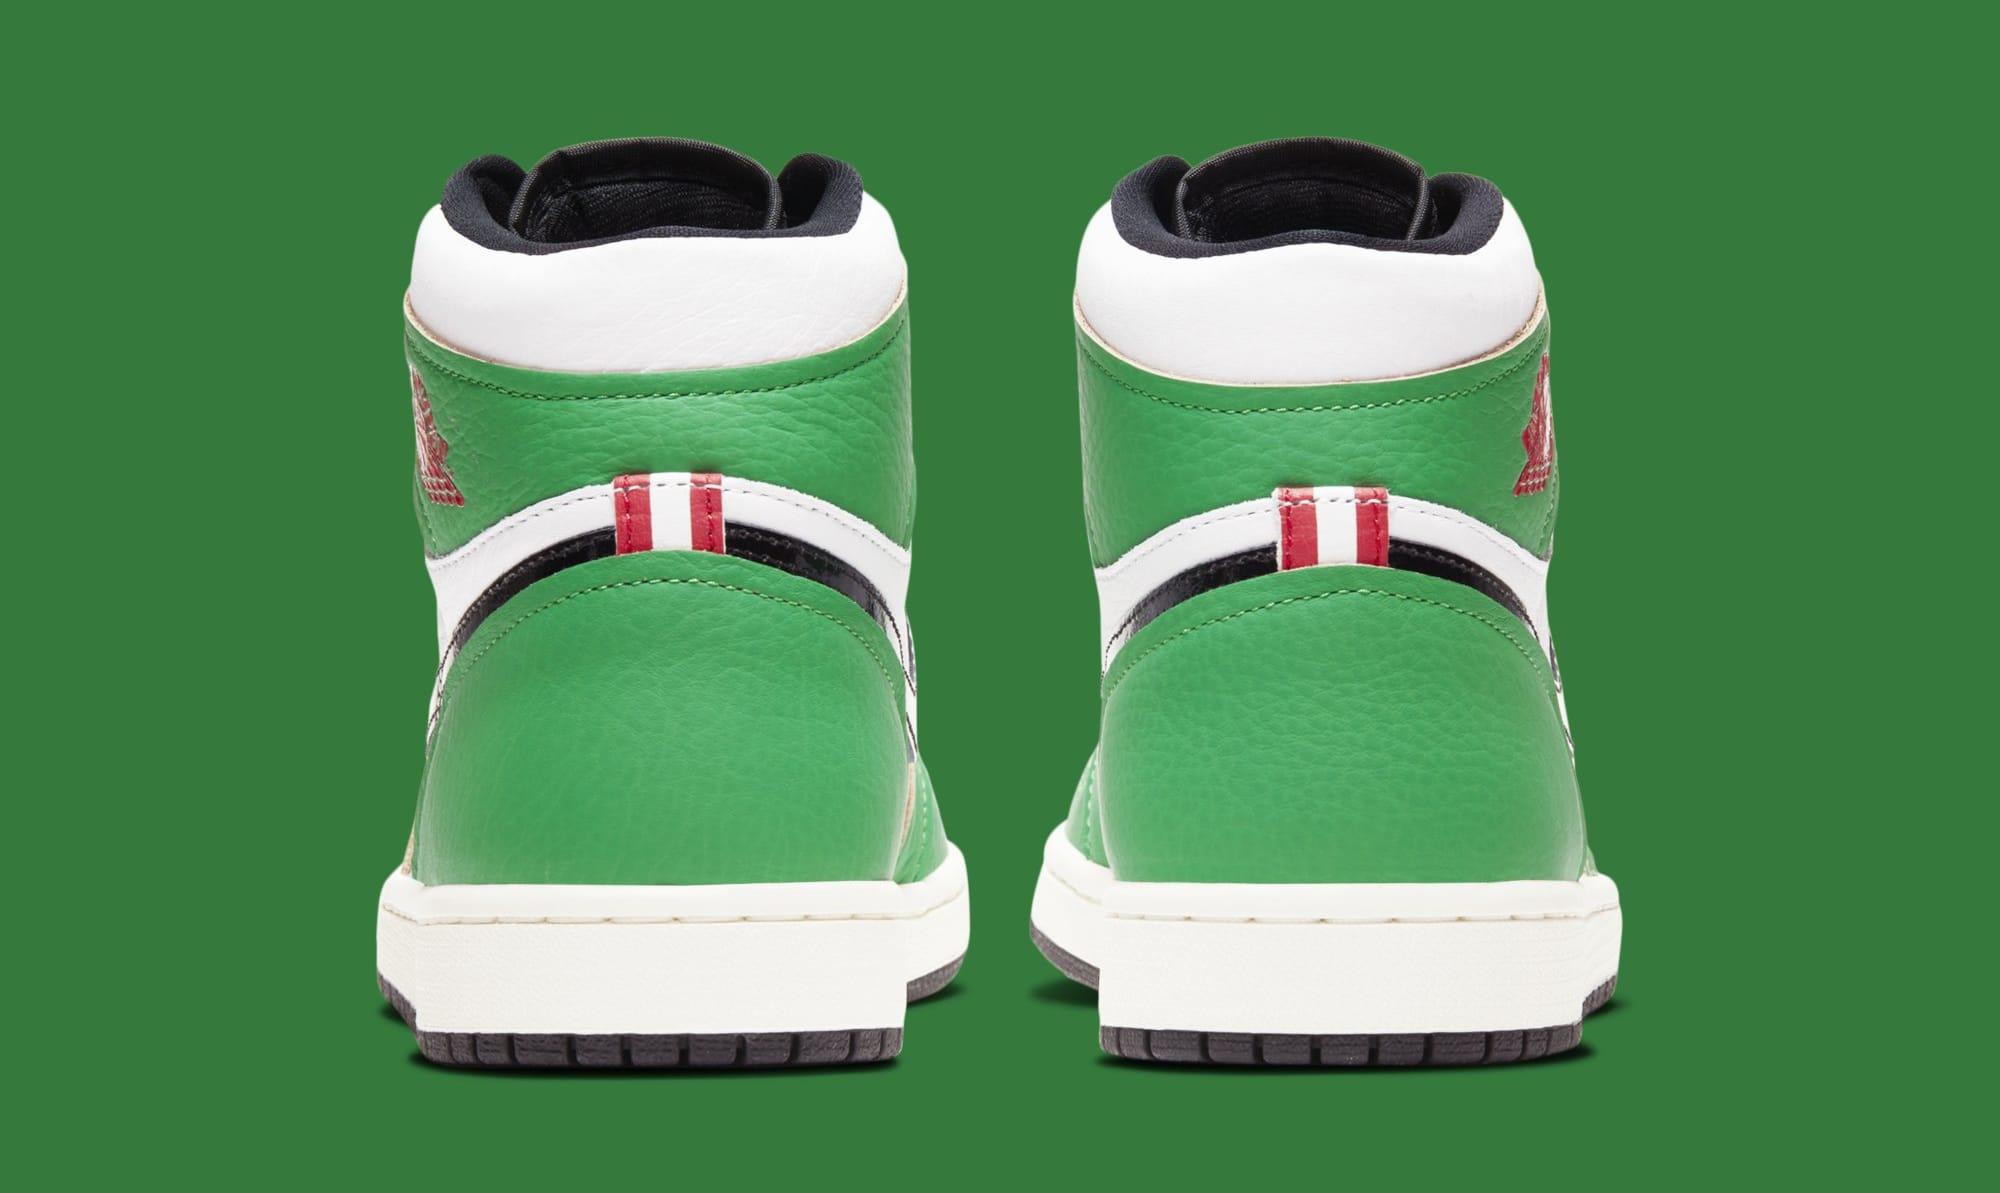 Air Jordan 1 Retro High OG Women's 'Lucky Green' DB4612-300 Heel